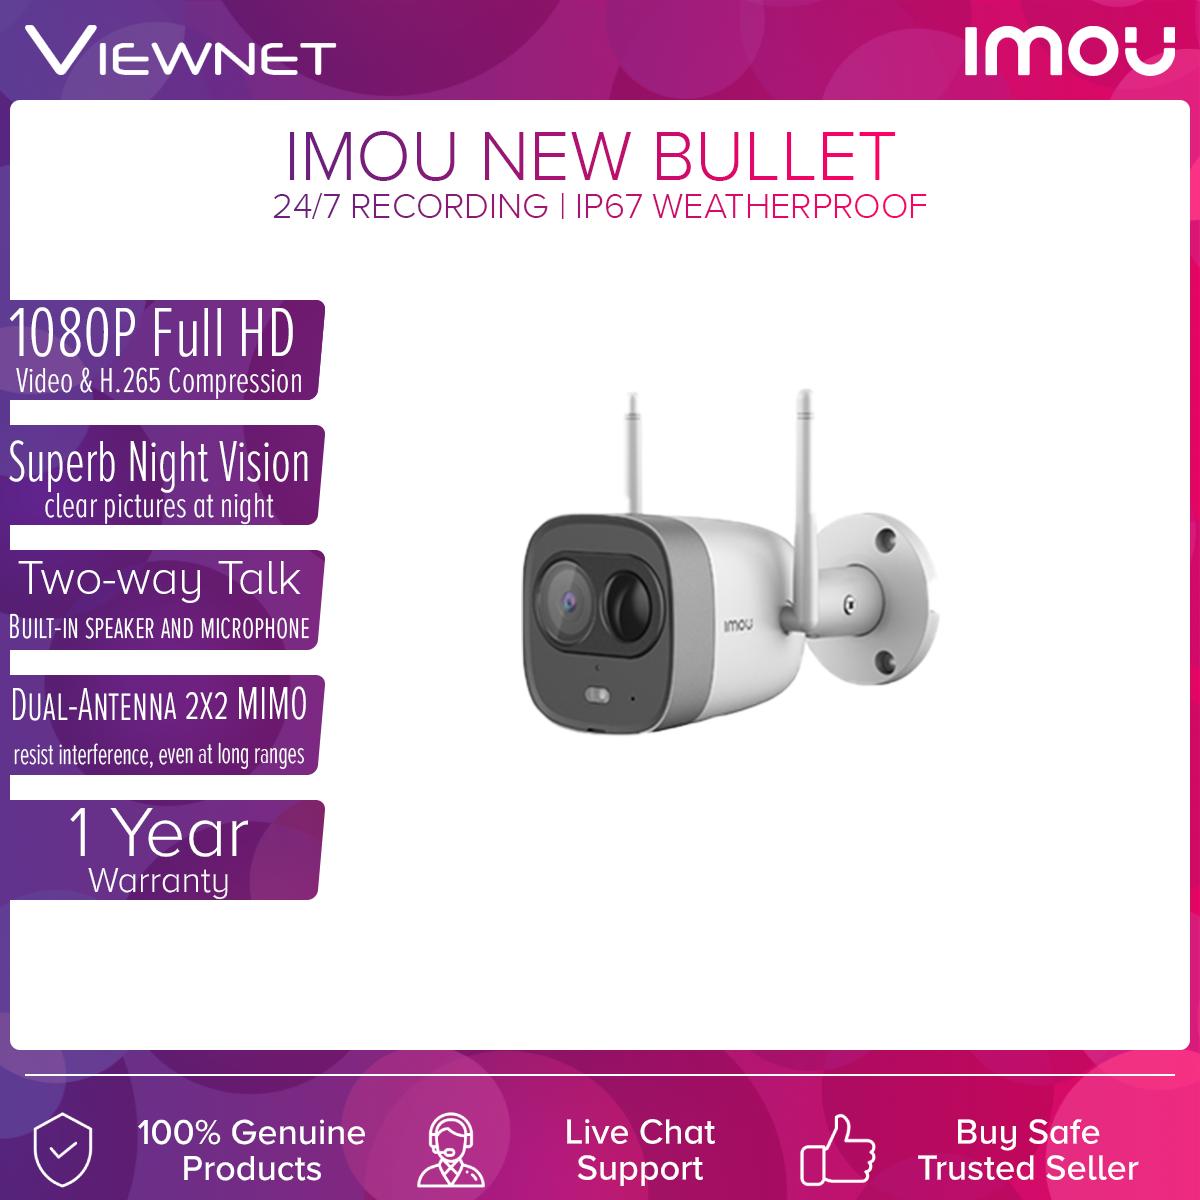 DAHUA IMOU New Bullet Weatherproof IP67 PIR Detection 1080P Full HD Wireless WiFi IP Camera with (CCTV) With Spotlight And Siren Alarm